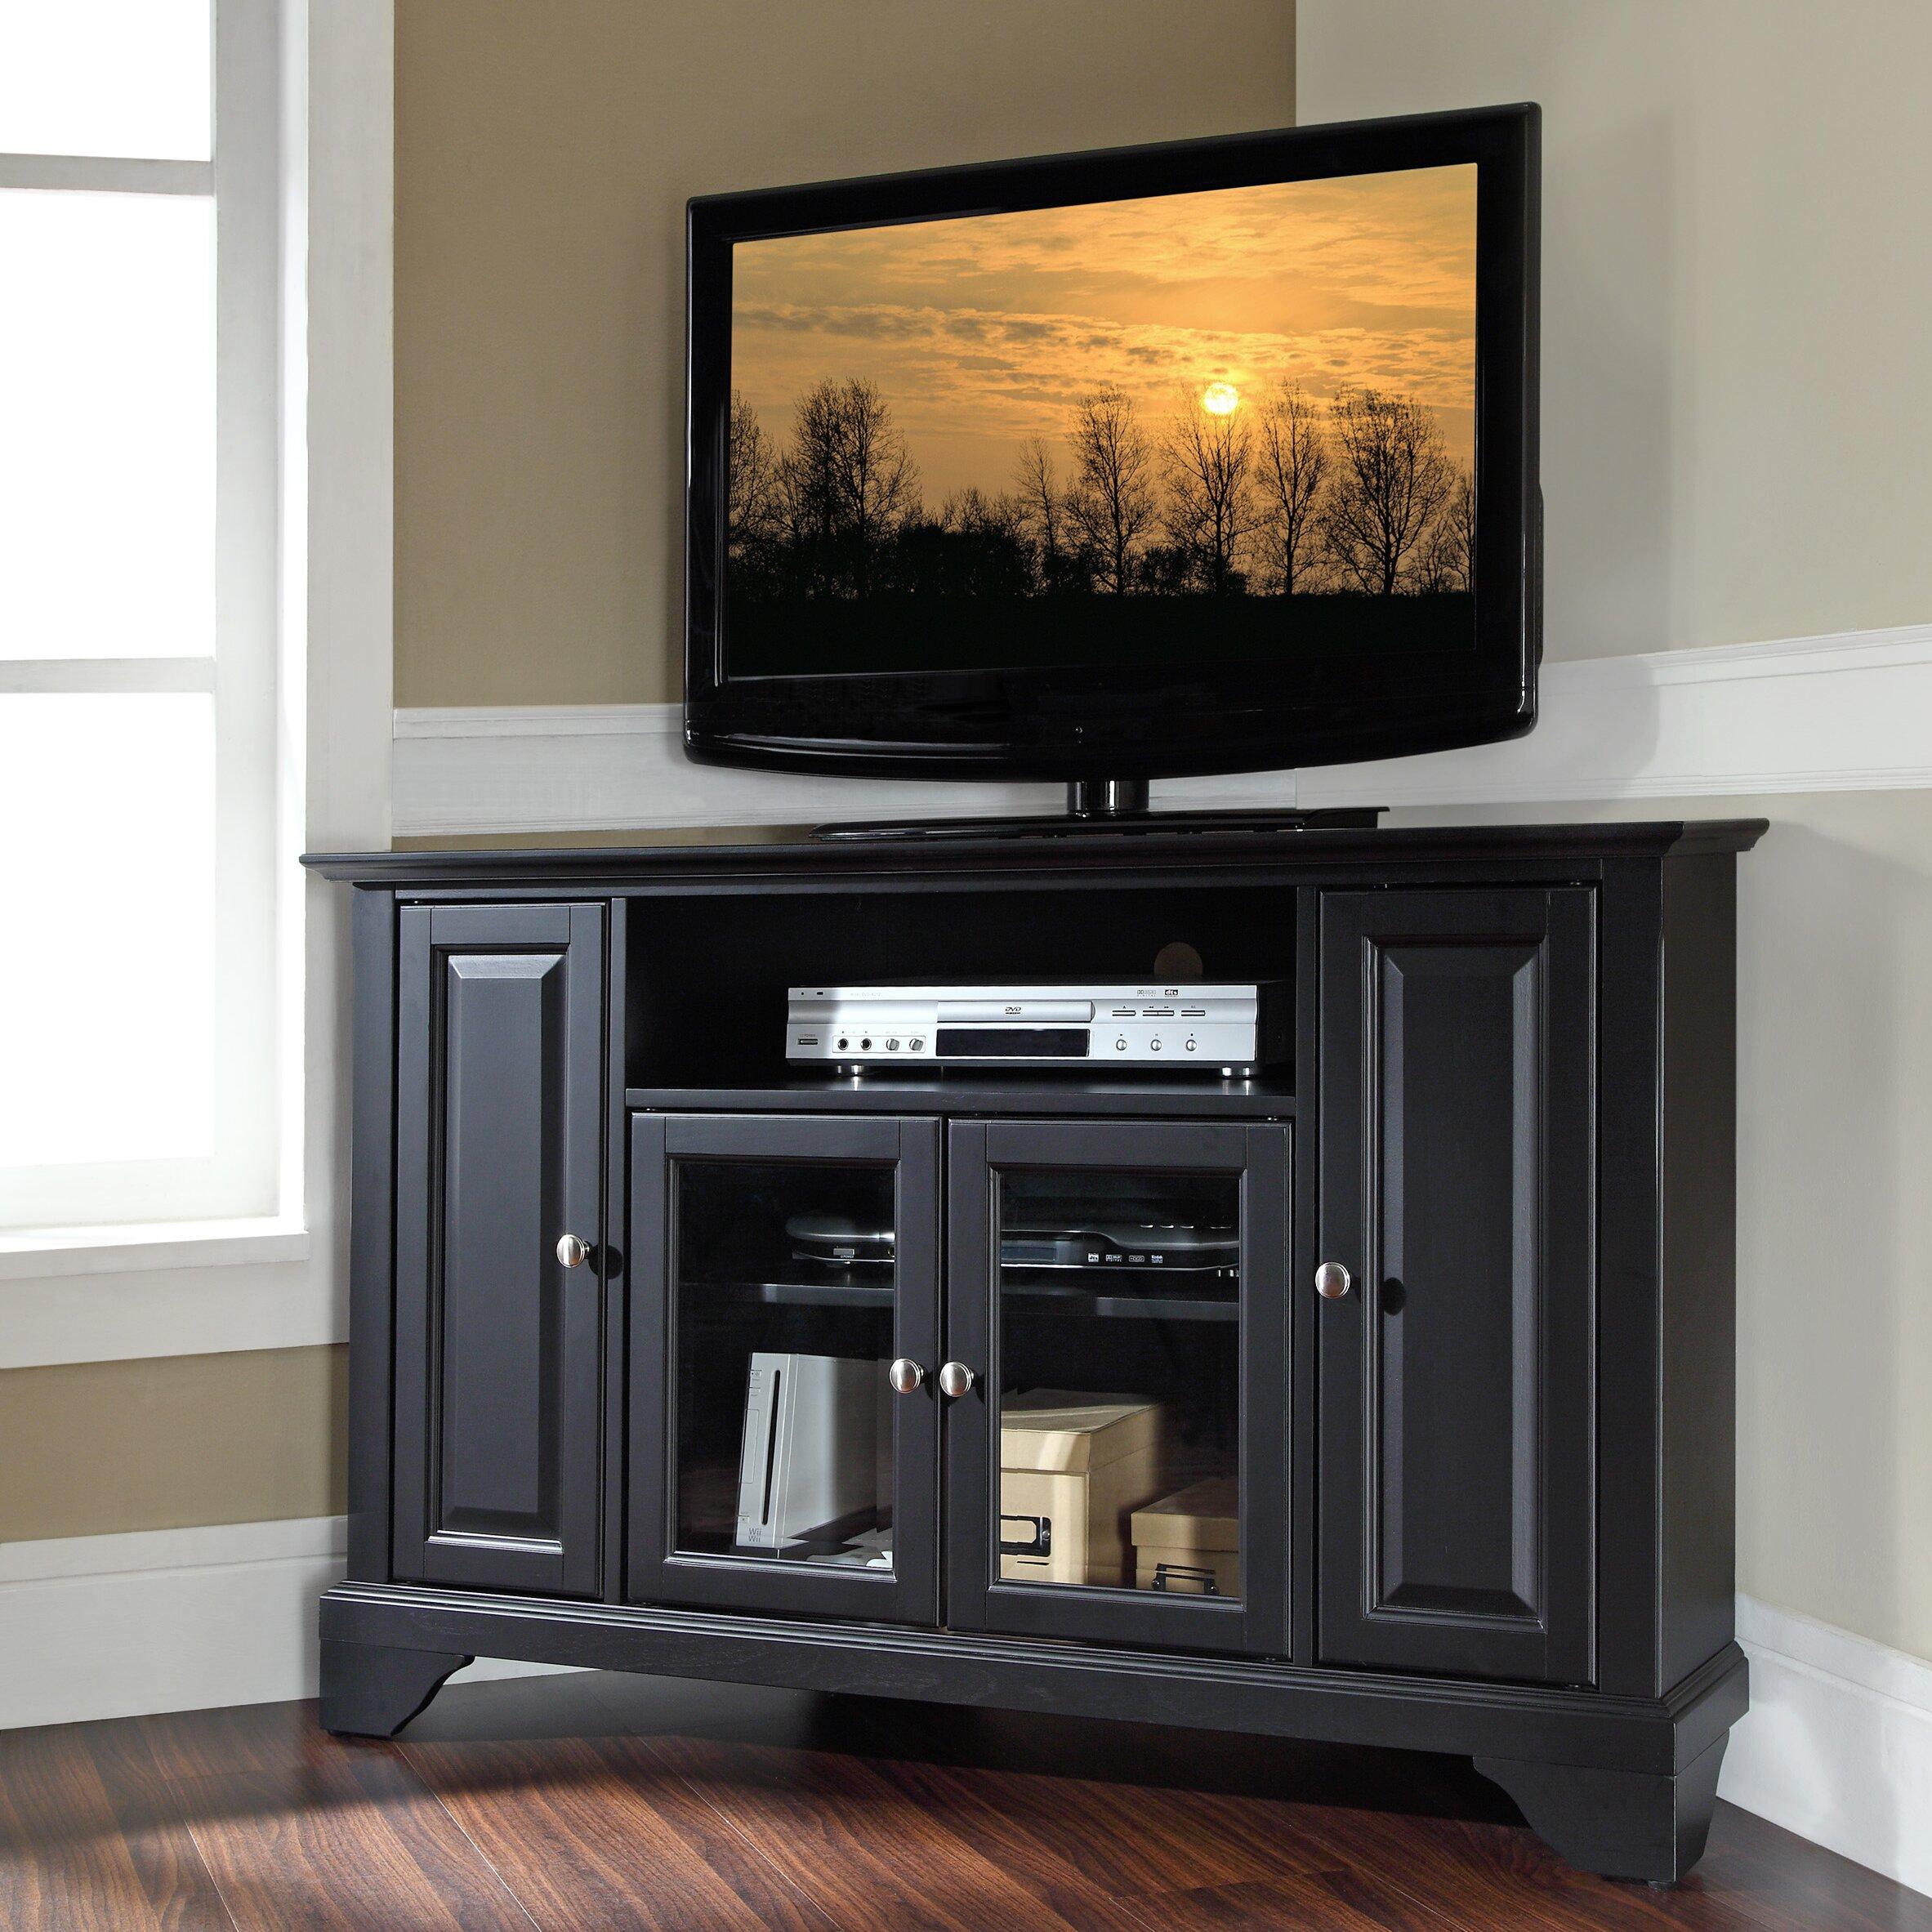 corner tv stands you'll love | wayfair